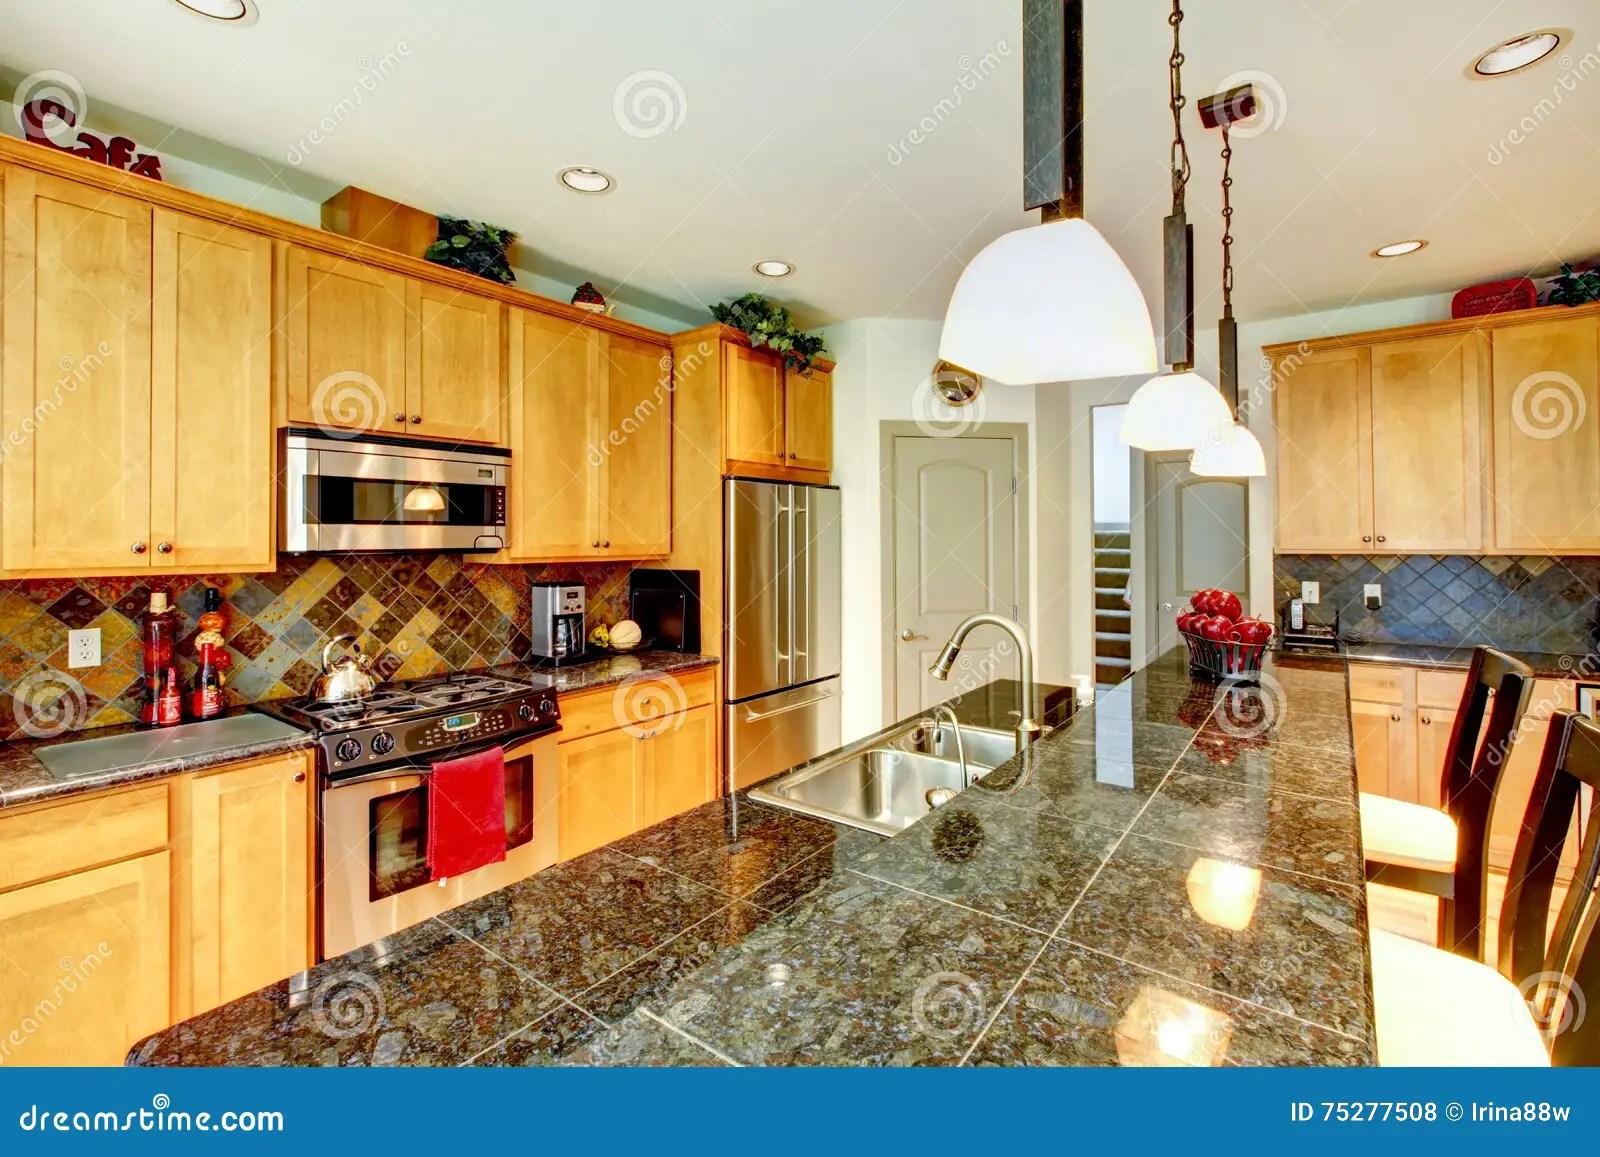 brown kitchen sink contemporary decor 有棕色内阁的厨房室 不锈钢 花岗岩桌面库存照片 图片包括有设计 冰箱 厨房与浅褐色的内阁 不锈钢和花岗岩桌面的室内部西北 美国